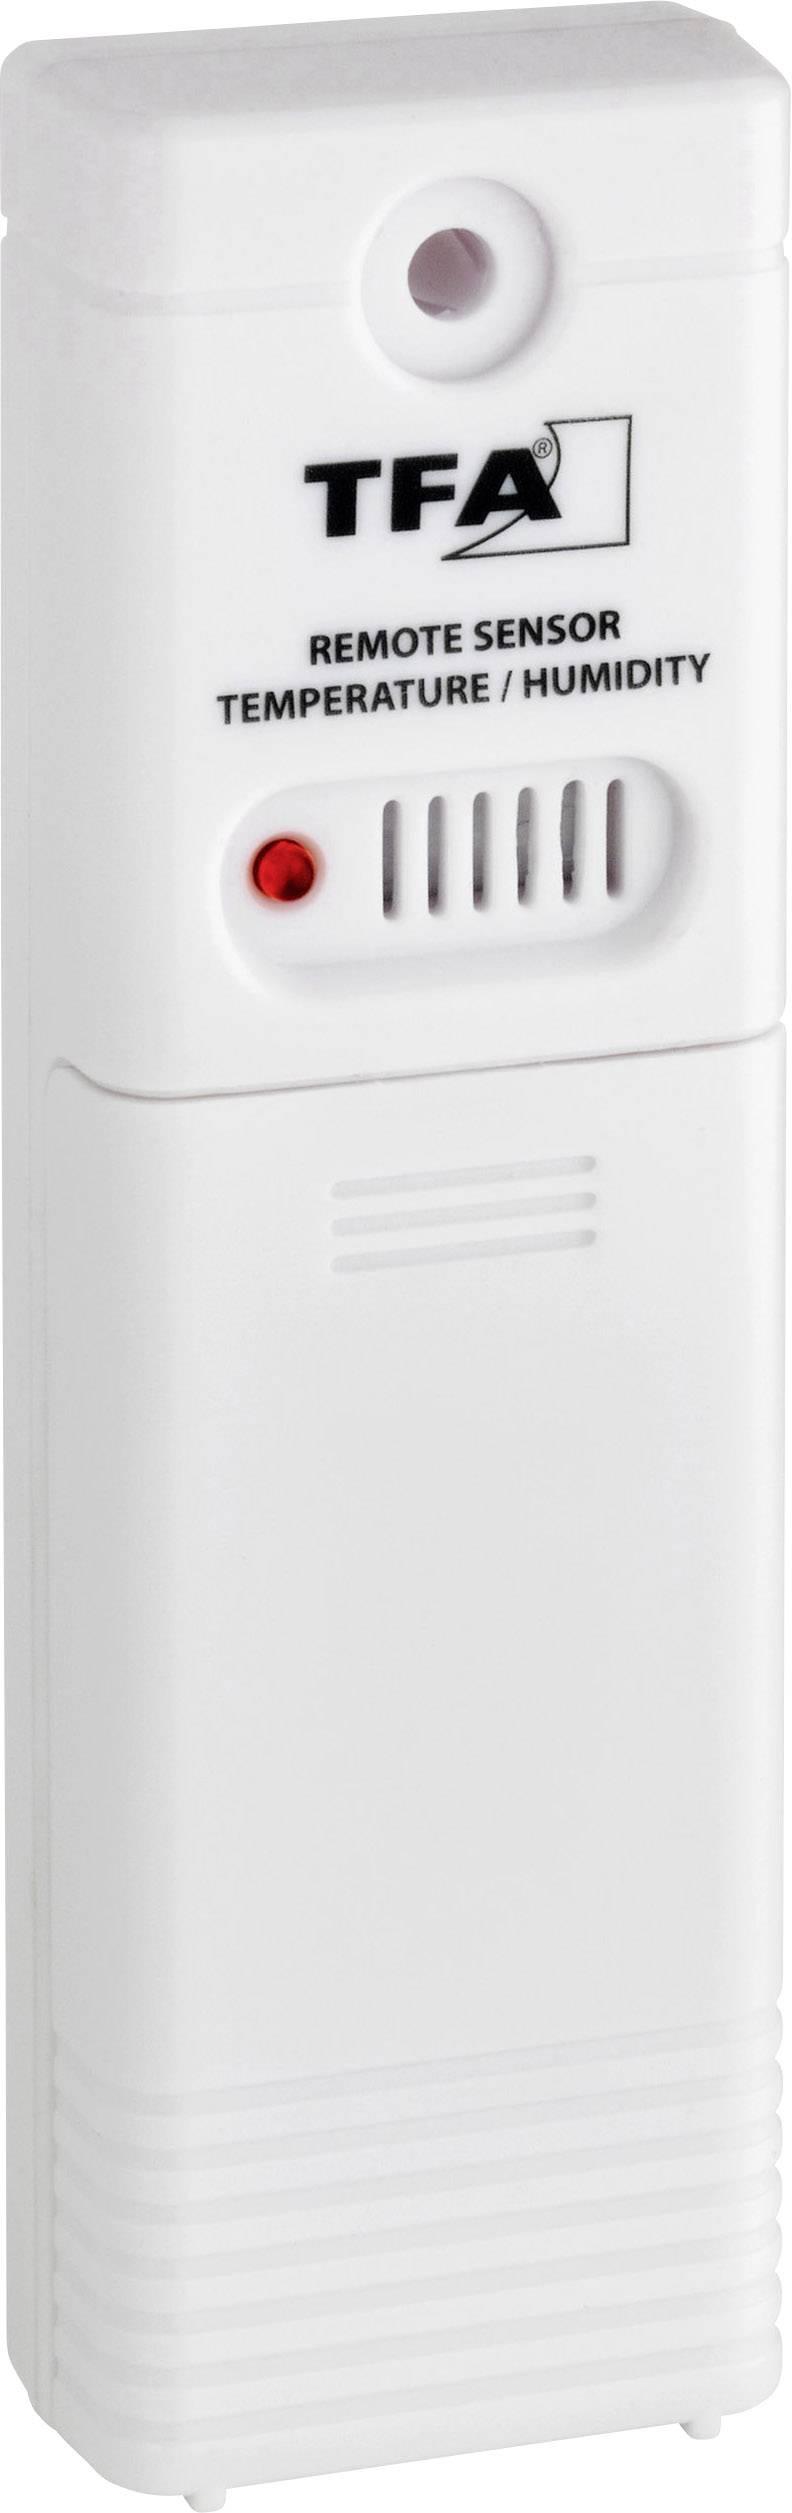 Kombinovaný senzor TFA 30.3221.02